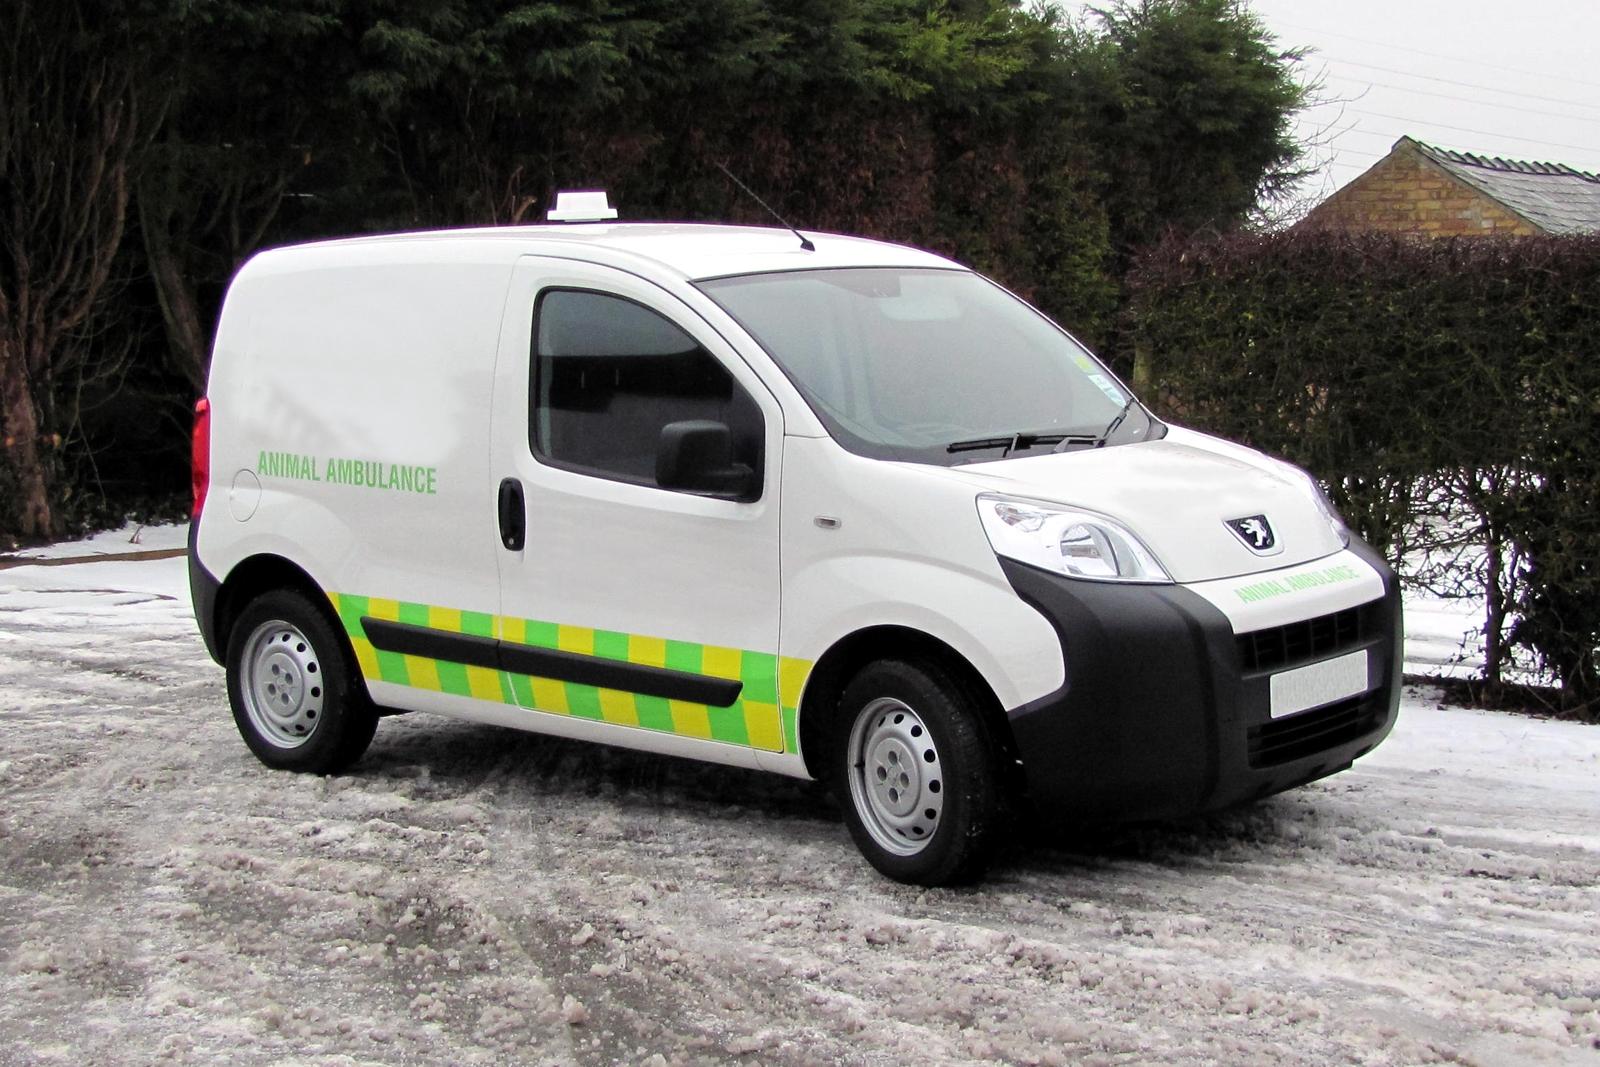 small peugeot van used as an animal ambulance